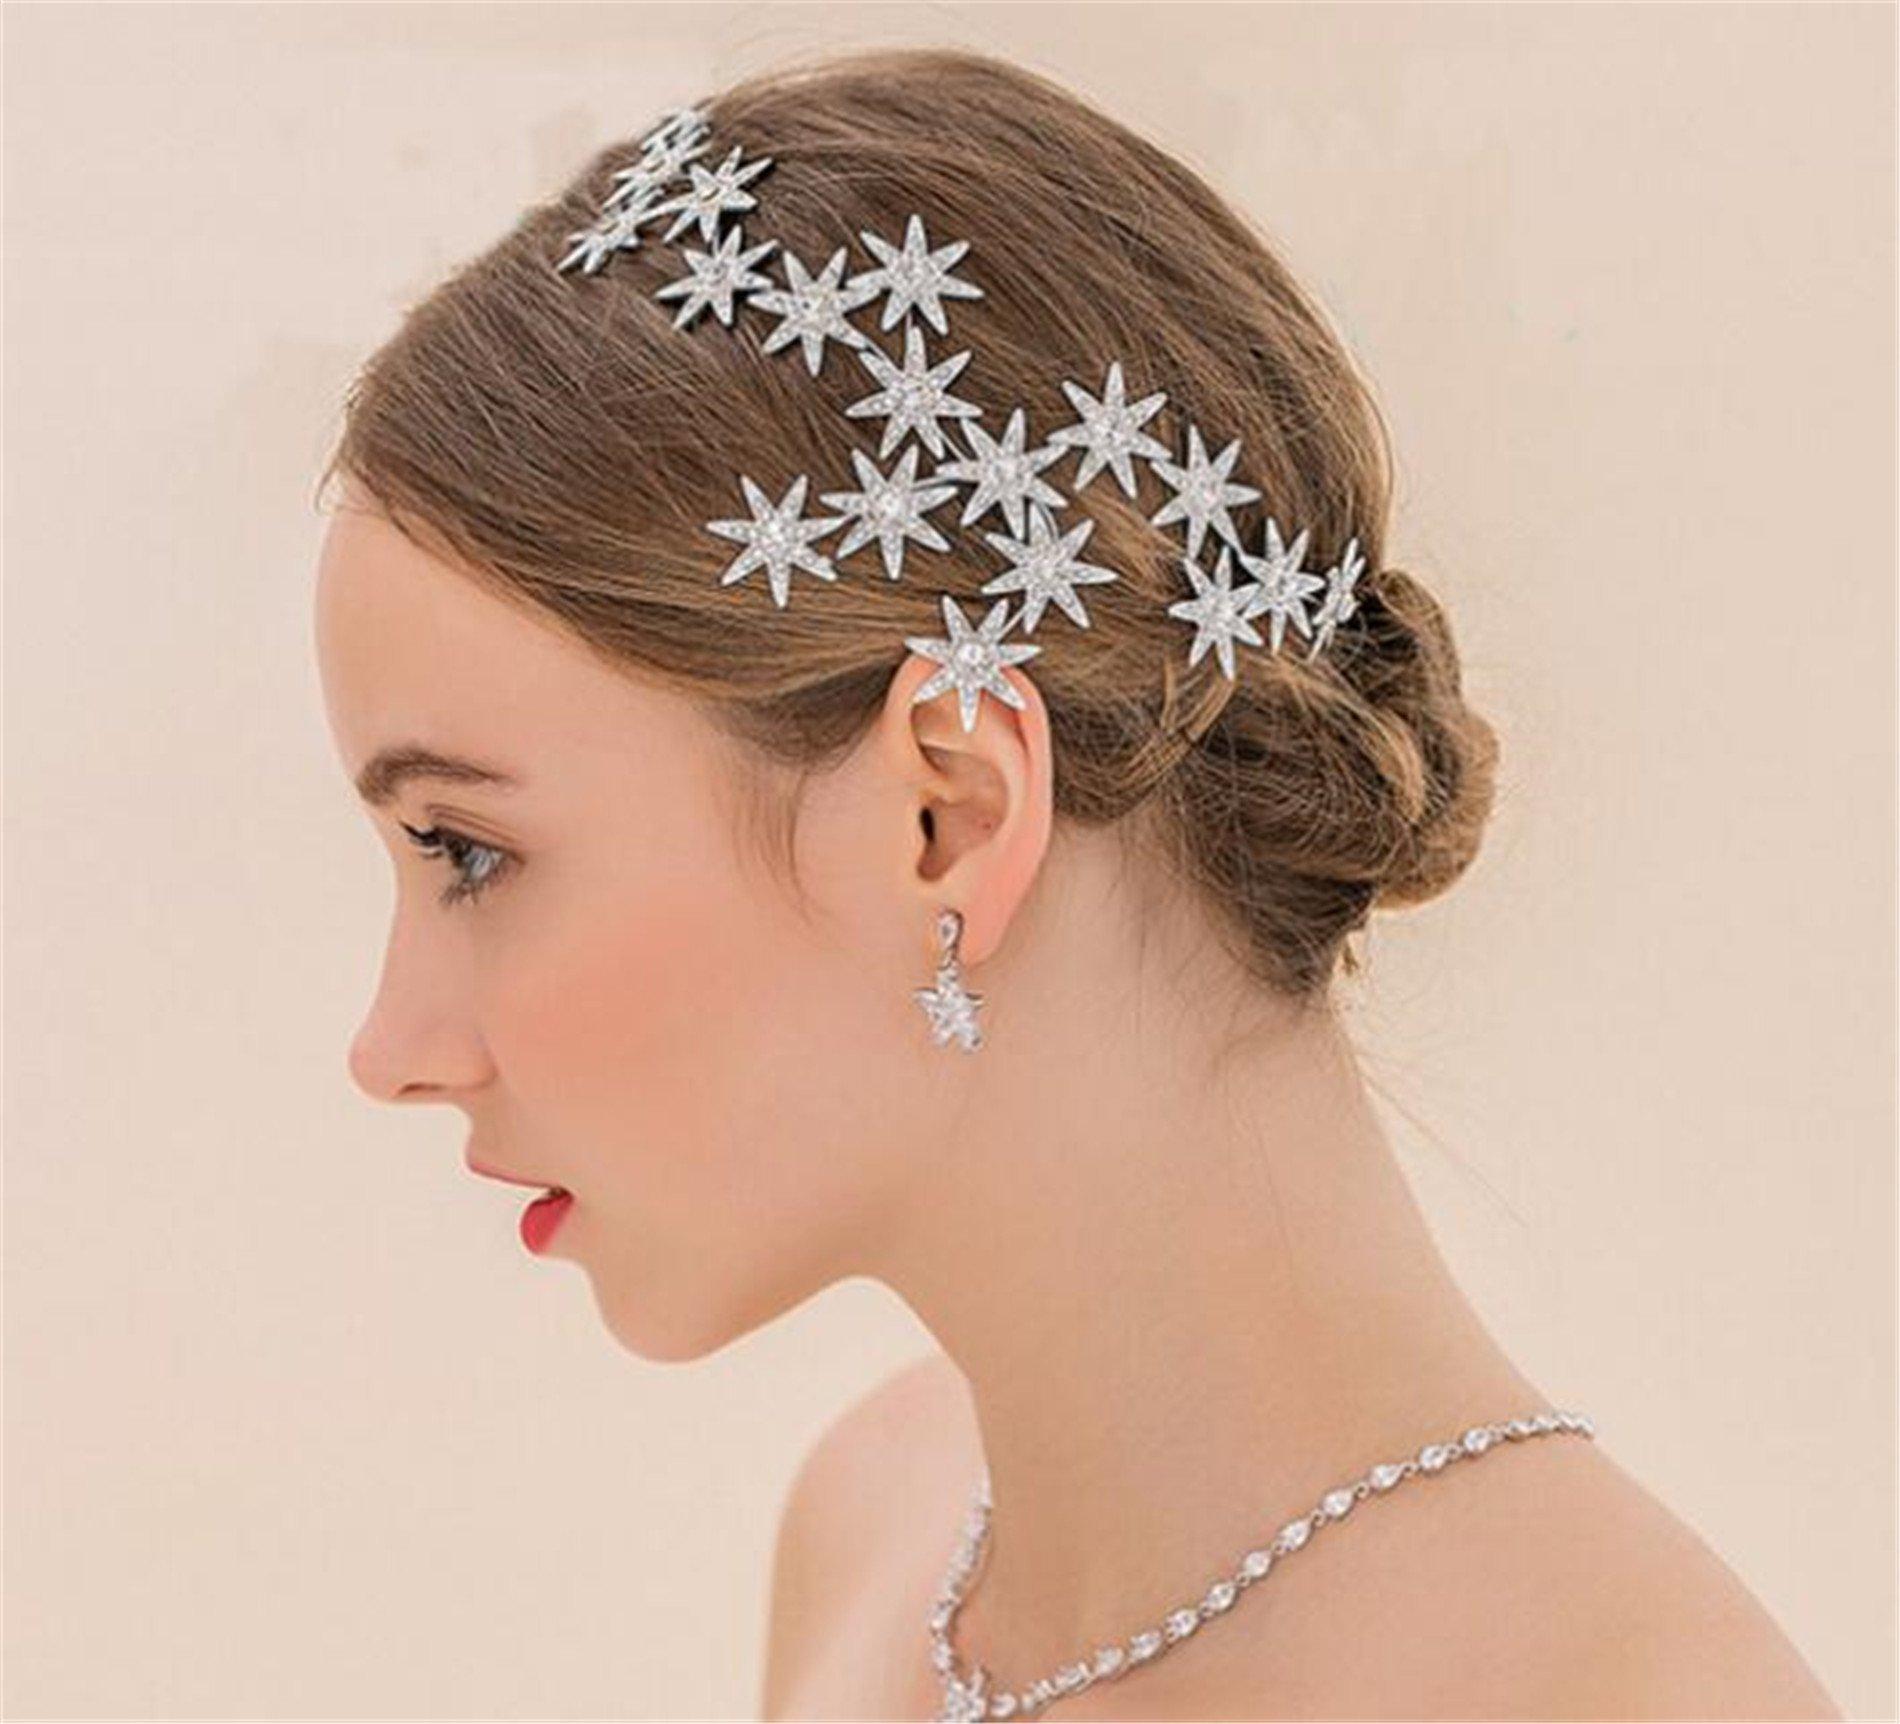 Luxury Sparkly Stars Style Rhinestones Wedding Bridal Headband Bride Hair Accessories(CR50)